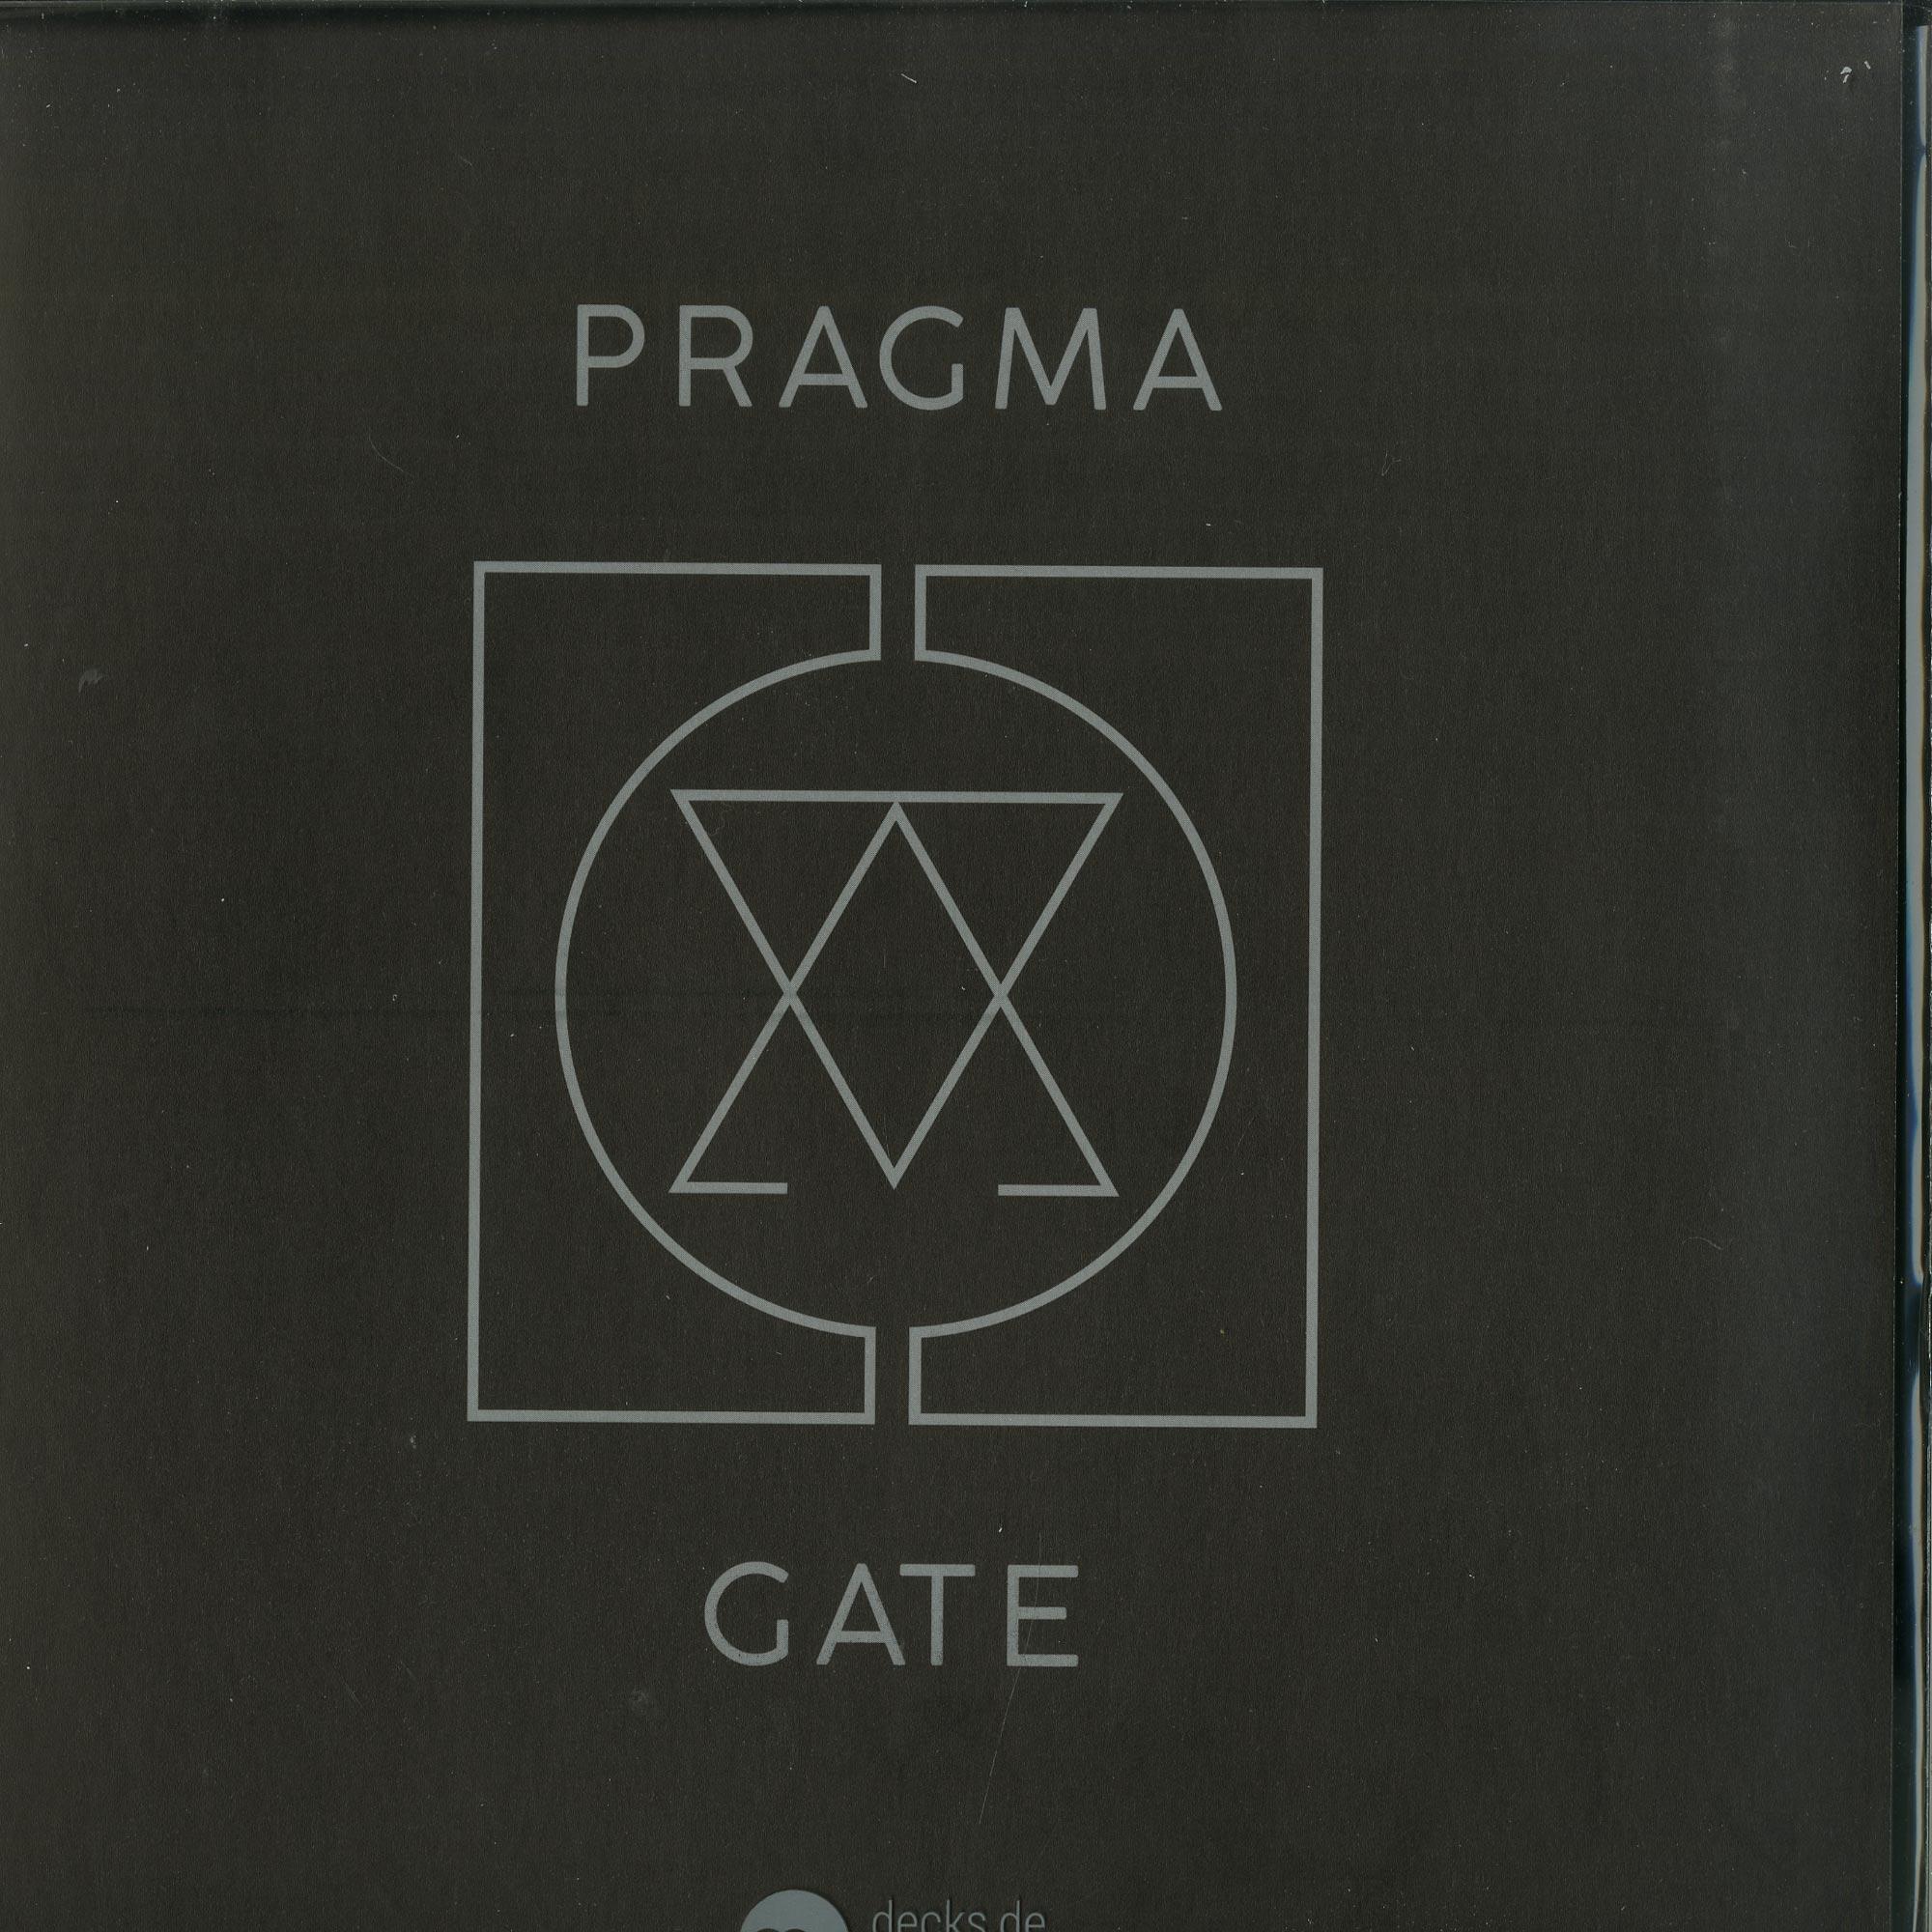 Pragma - GATE EP